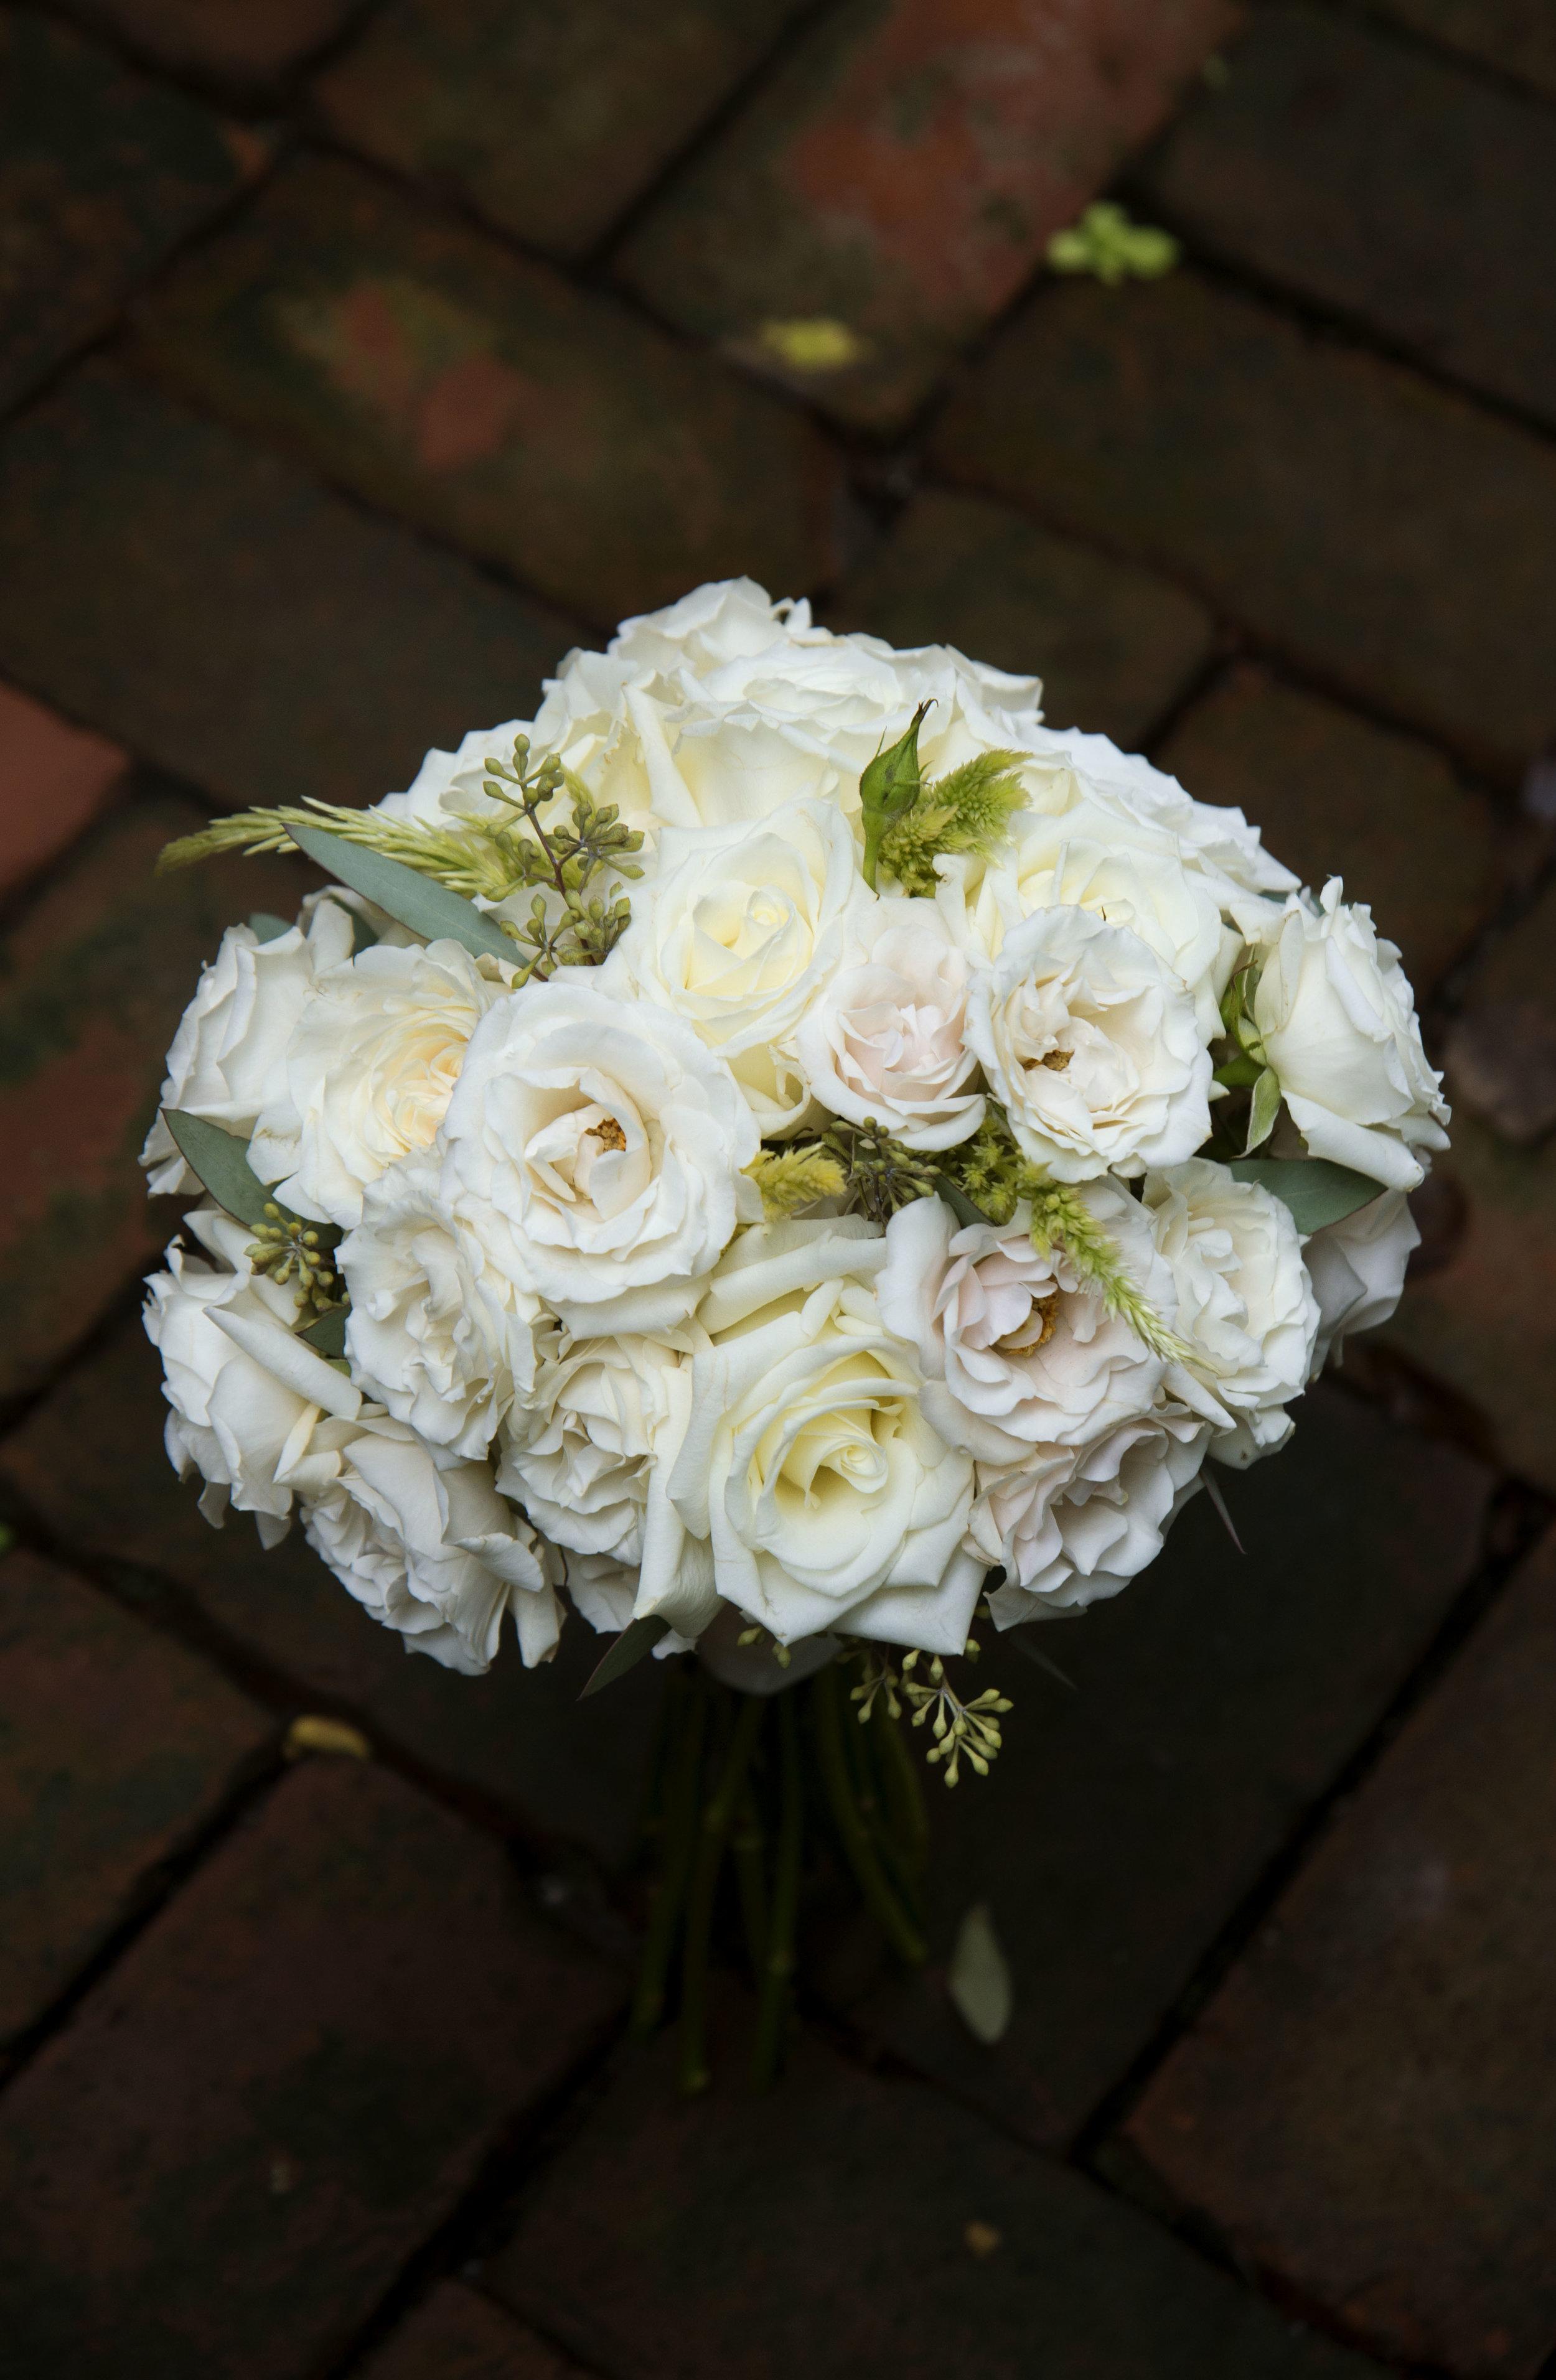 fall bouquet mitchs flowers new orleans florist destination wedding nola simply eloped stephanie tarrant.jpg